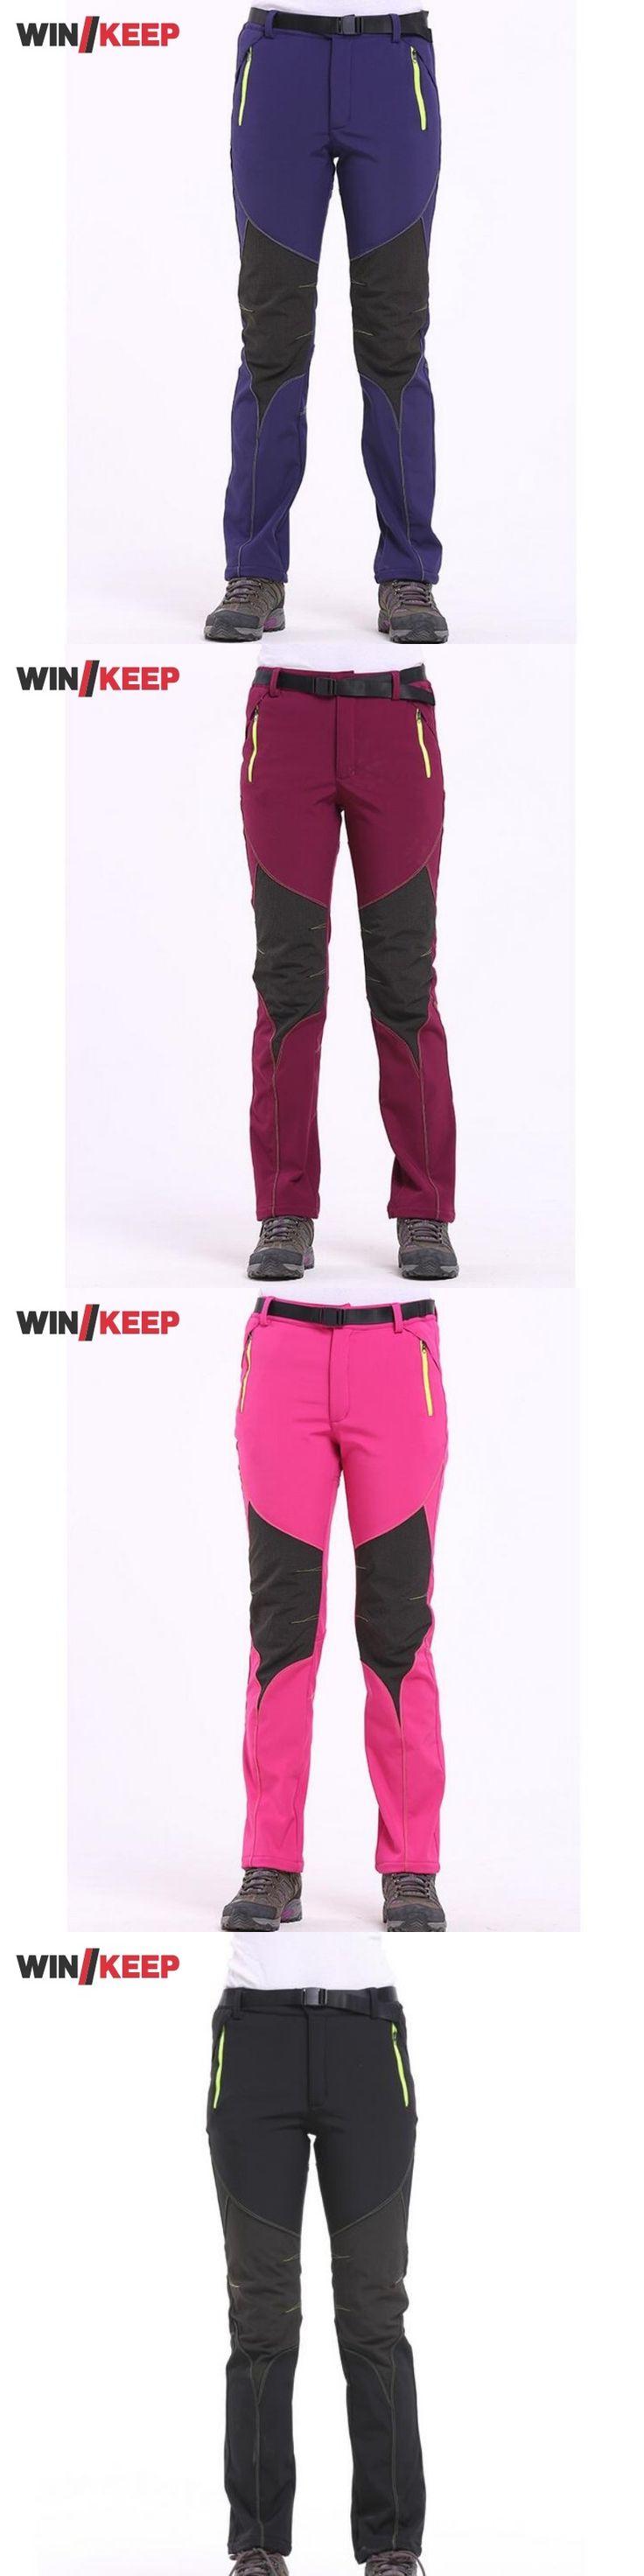 Climbing Women Hiking Pants Softshell Velvet Warm Trousers For Women Outdoor Patchwork Feminino Sports Pants Windbreaker Trouser